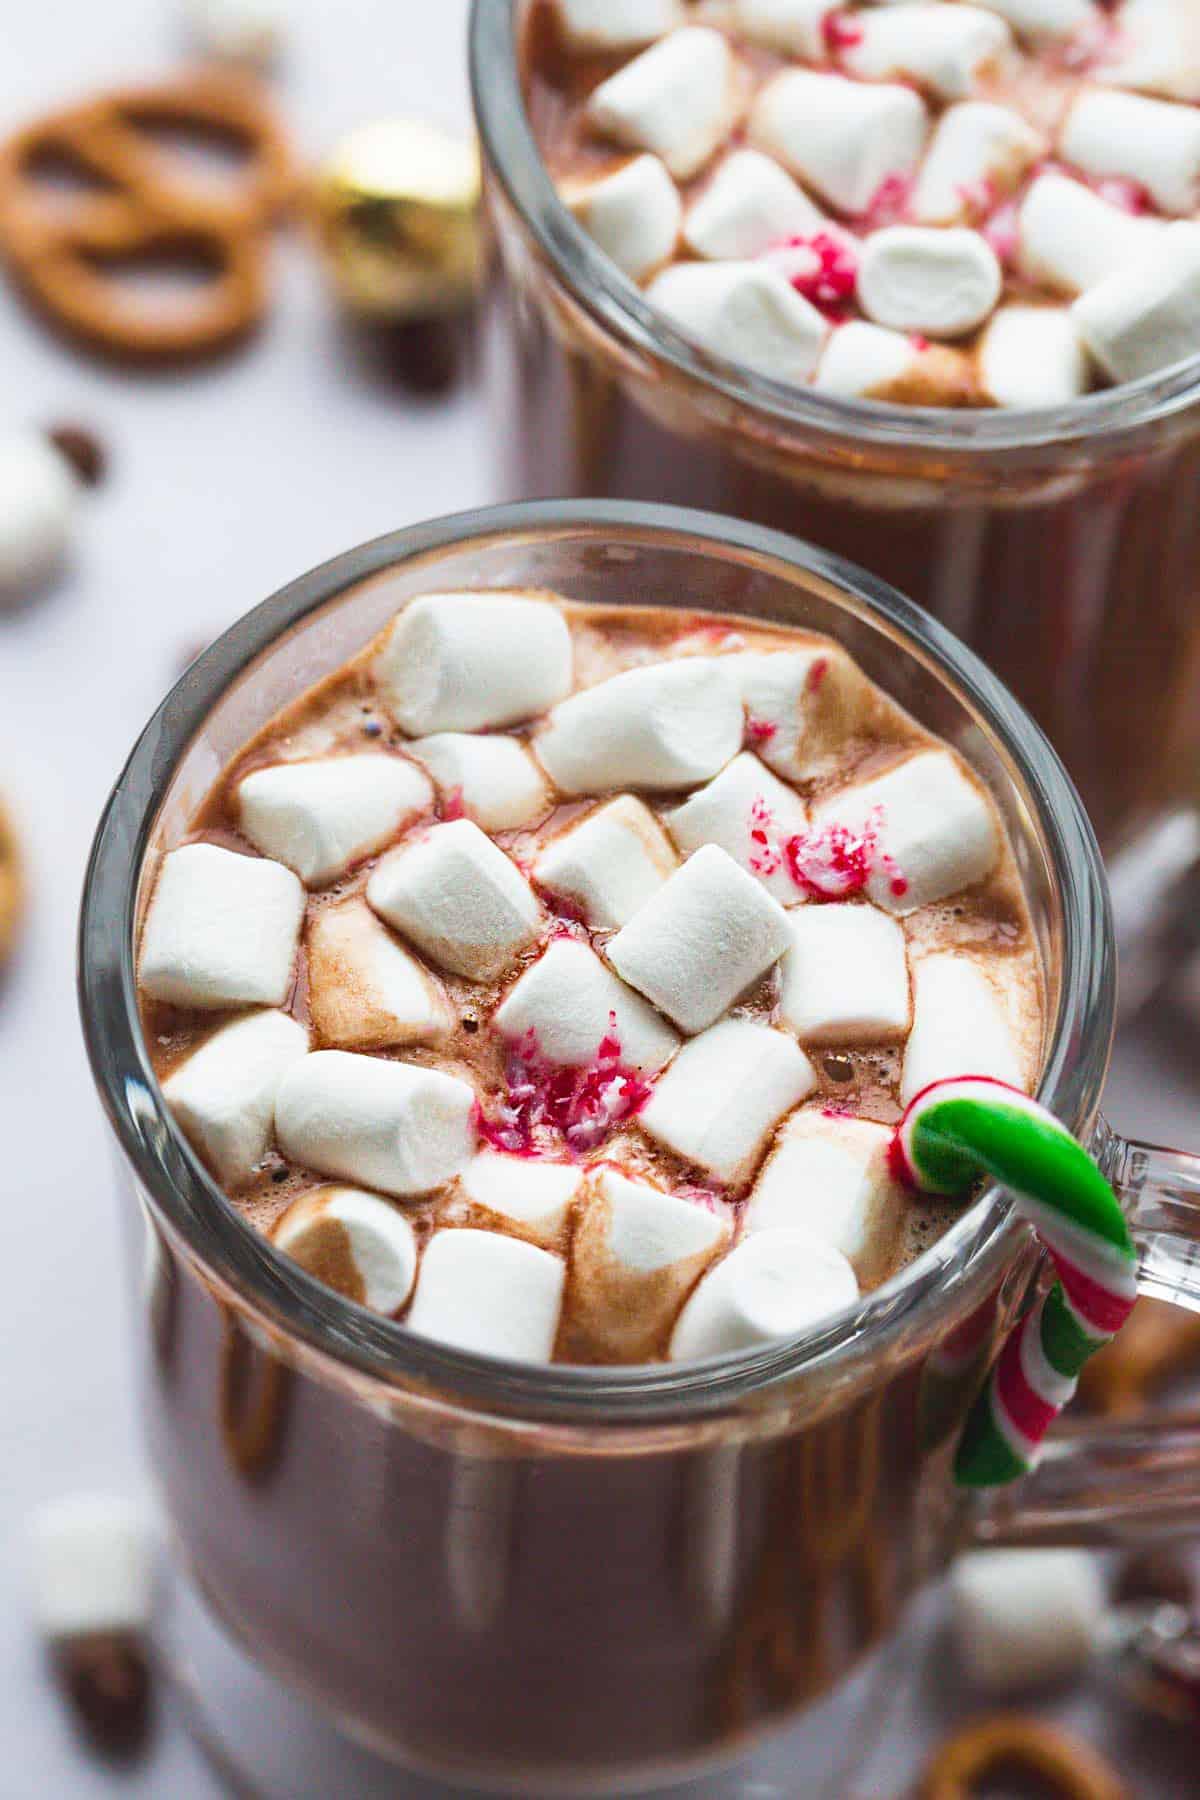 A close up shot of a mug with hot chocolate and marshmallows